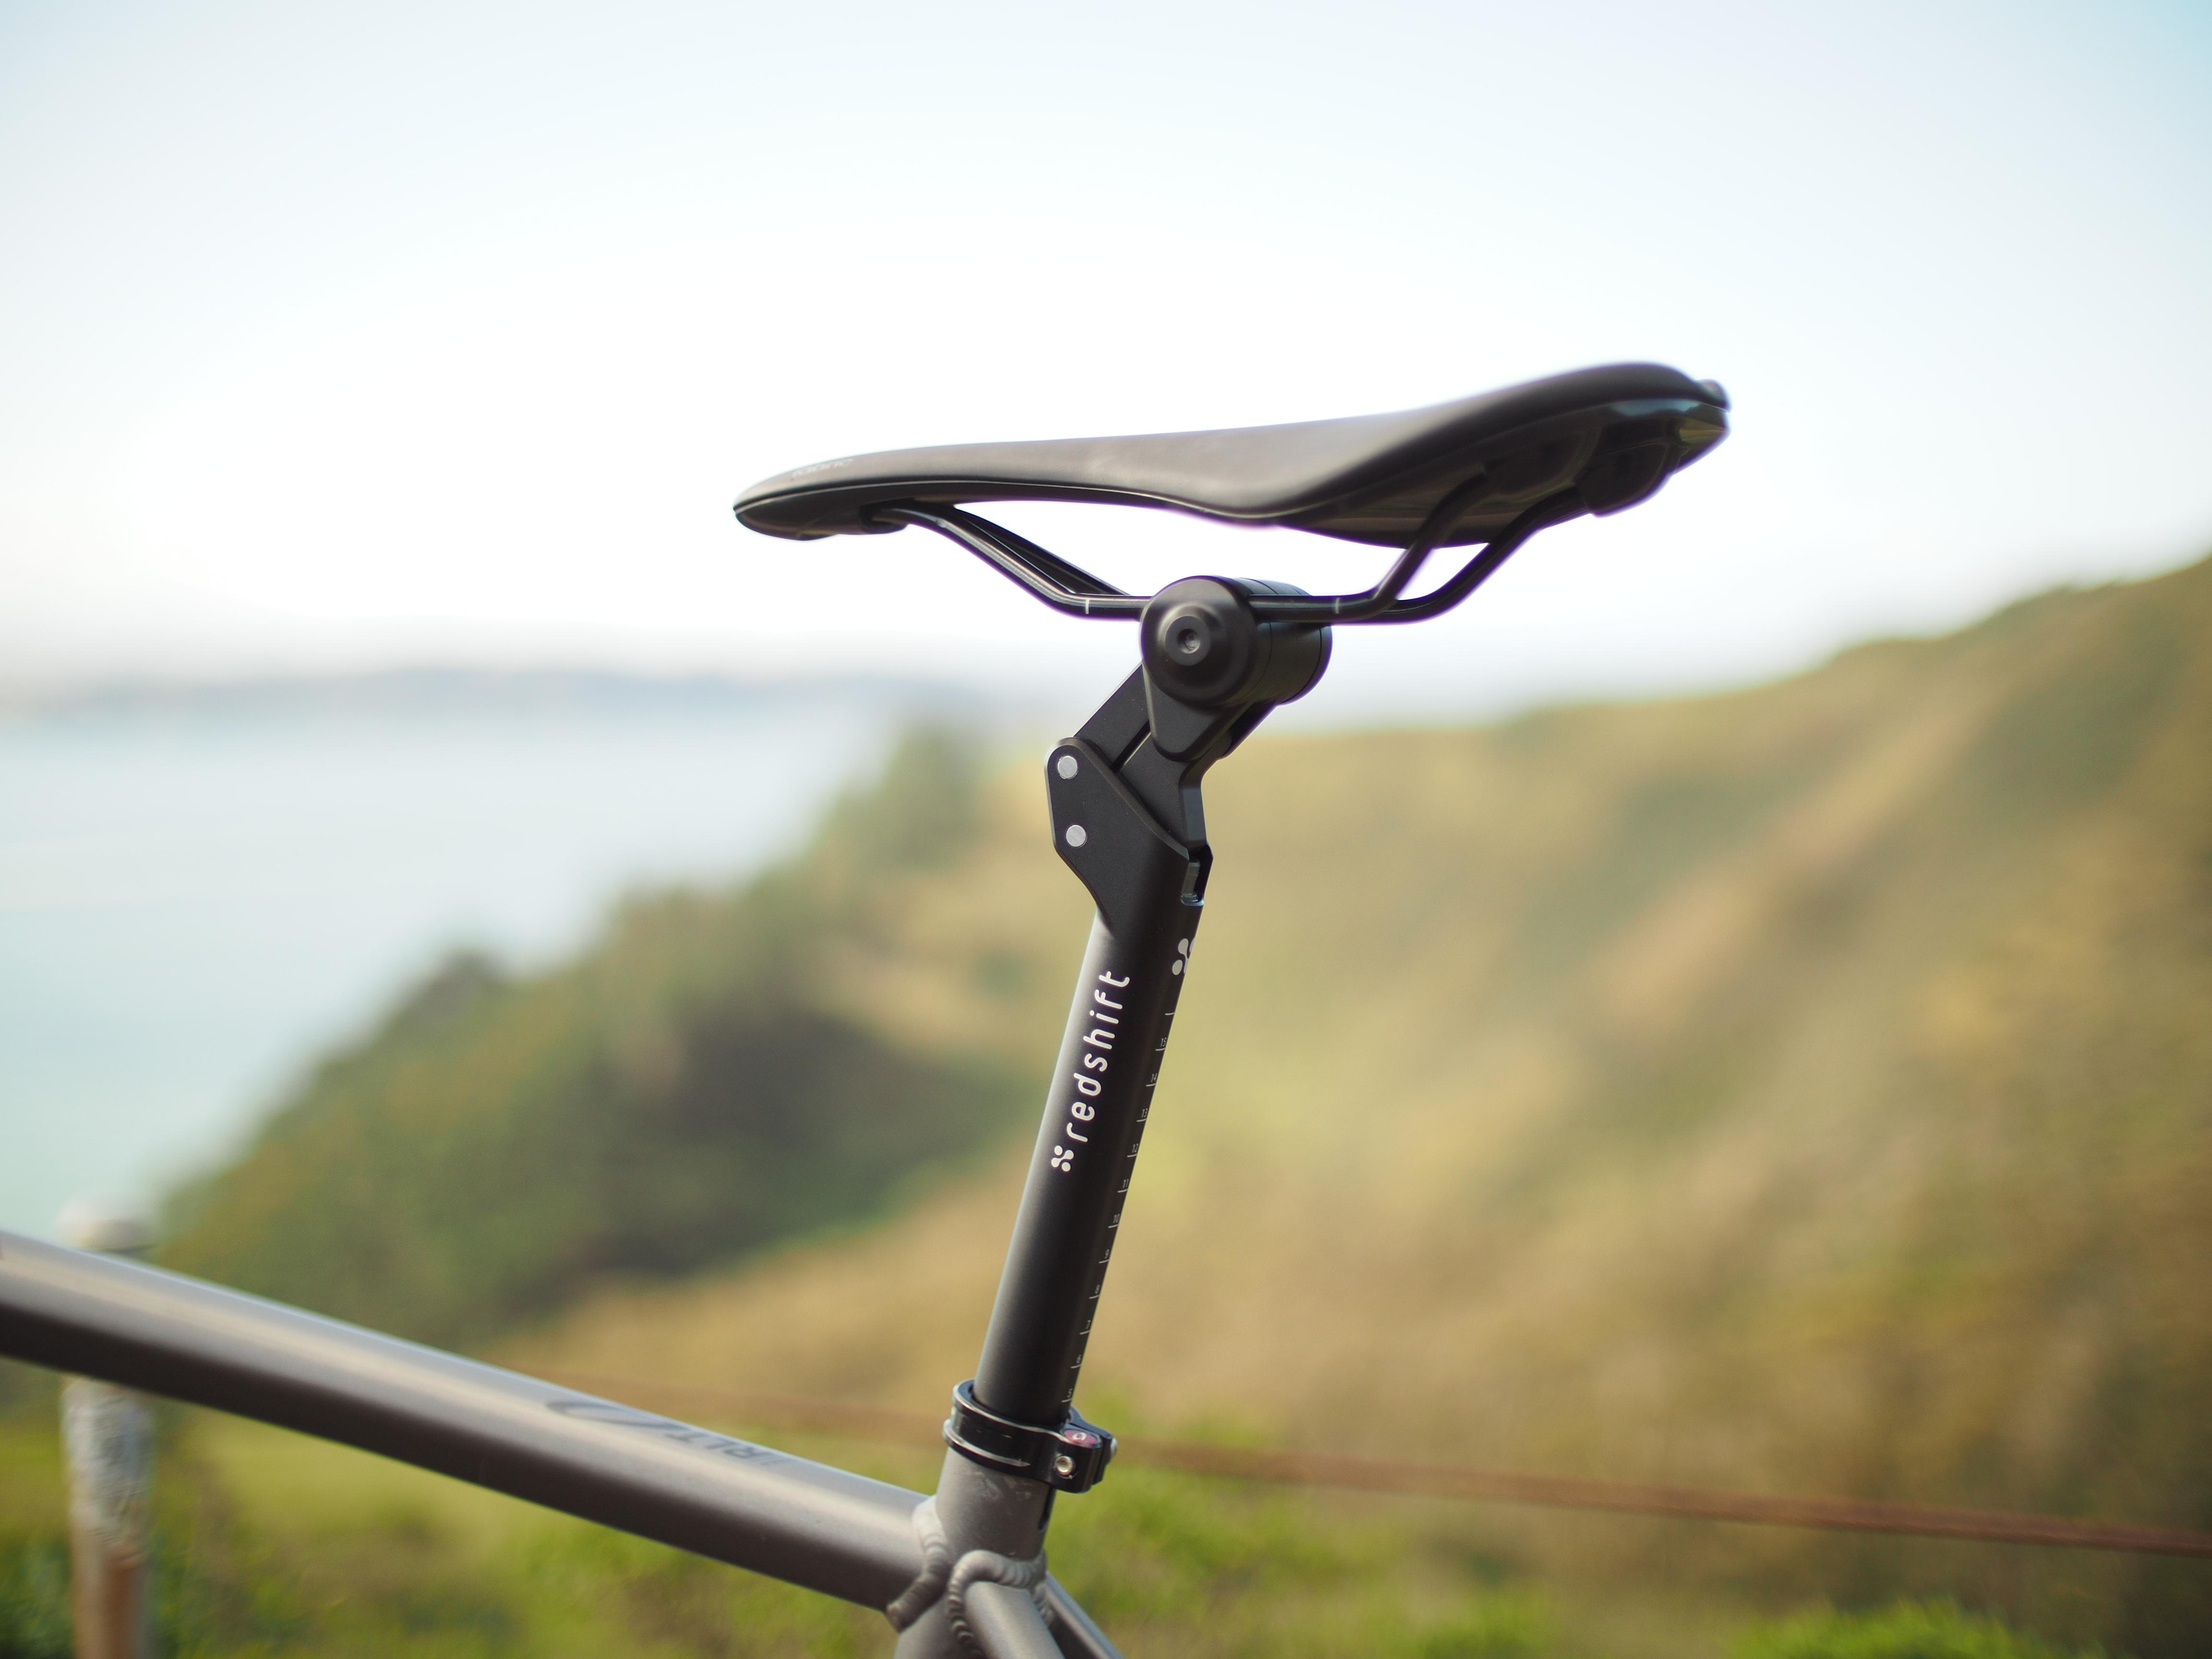 suspension seatpost | the accidental randonneur